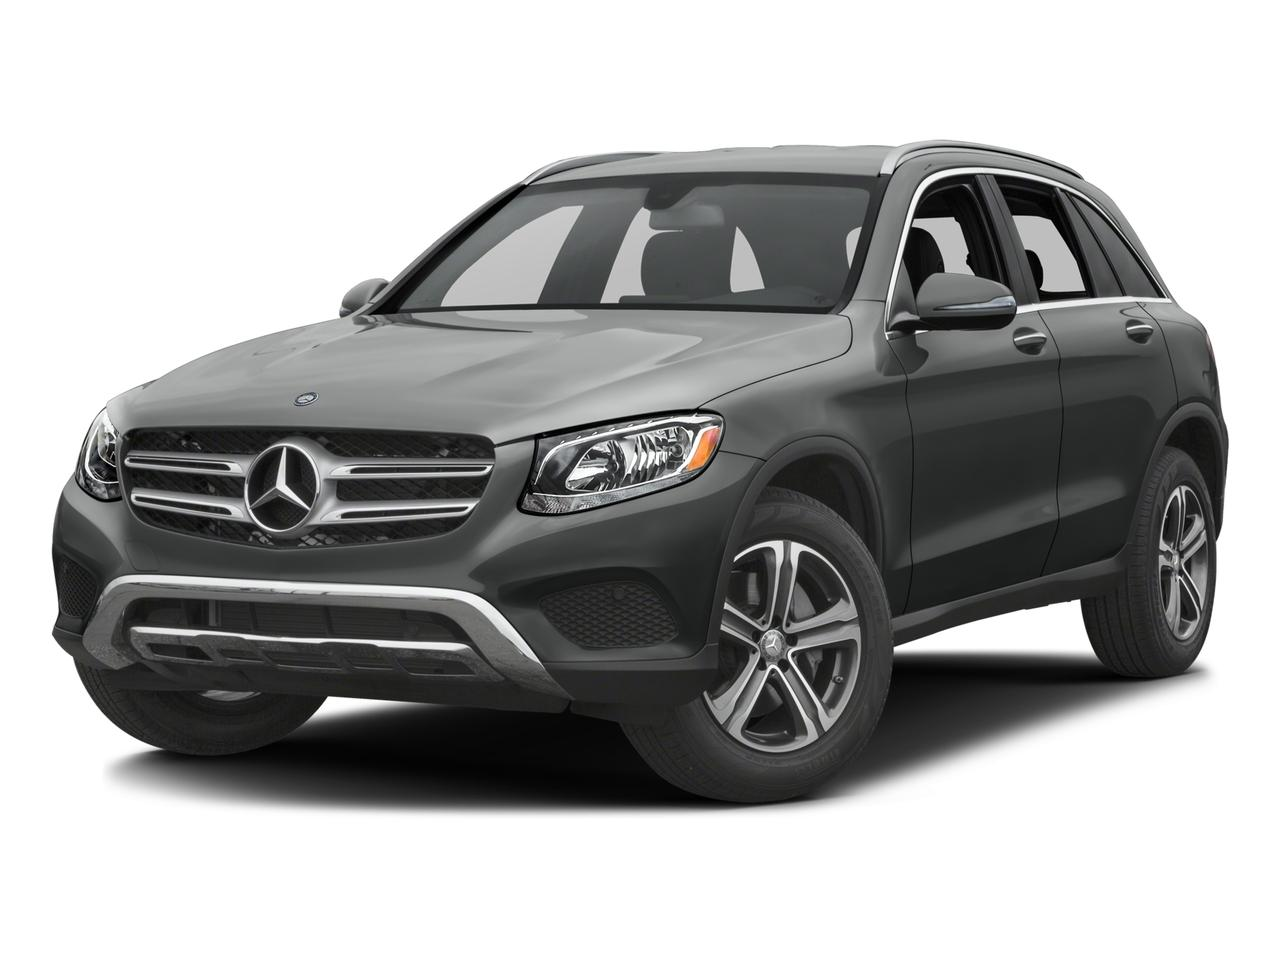 2016 Mercedes-Benz GLC Vehicle Photo in Portland, OR 97225